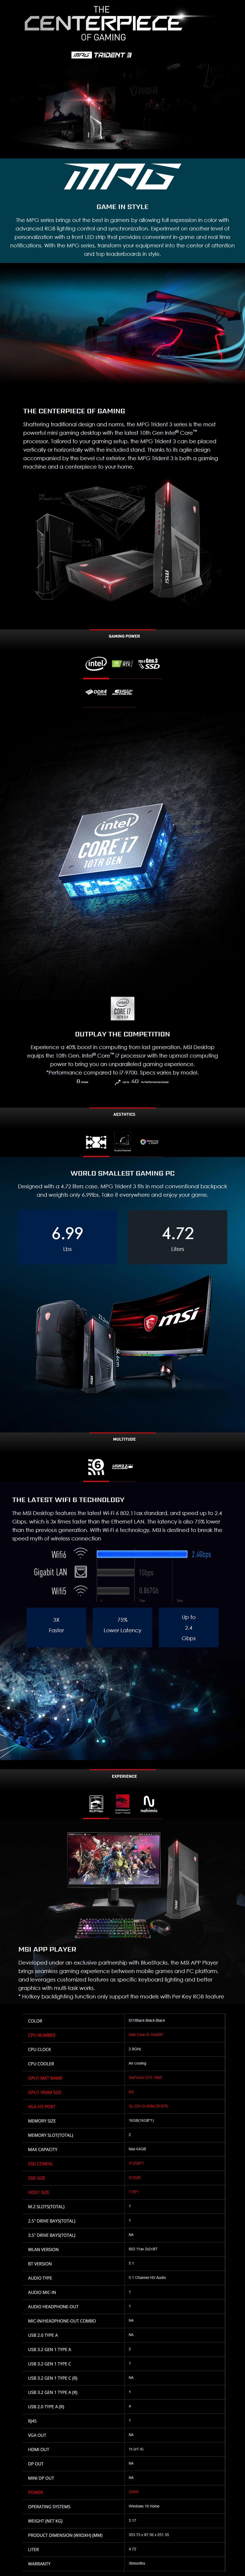 msi-trident-3-compact-gaming-pc-i510400f-16gb-512gb-1tb-gtx1660-win10-ac19898-3-1-.jpg